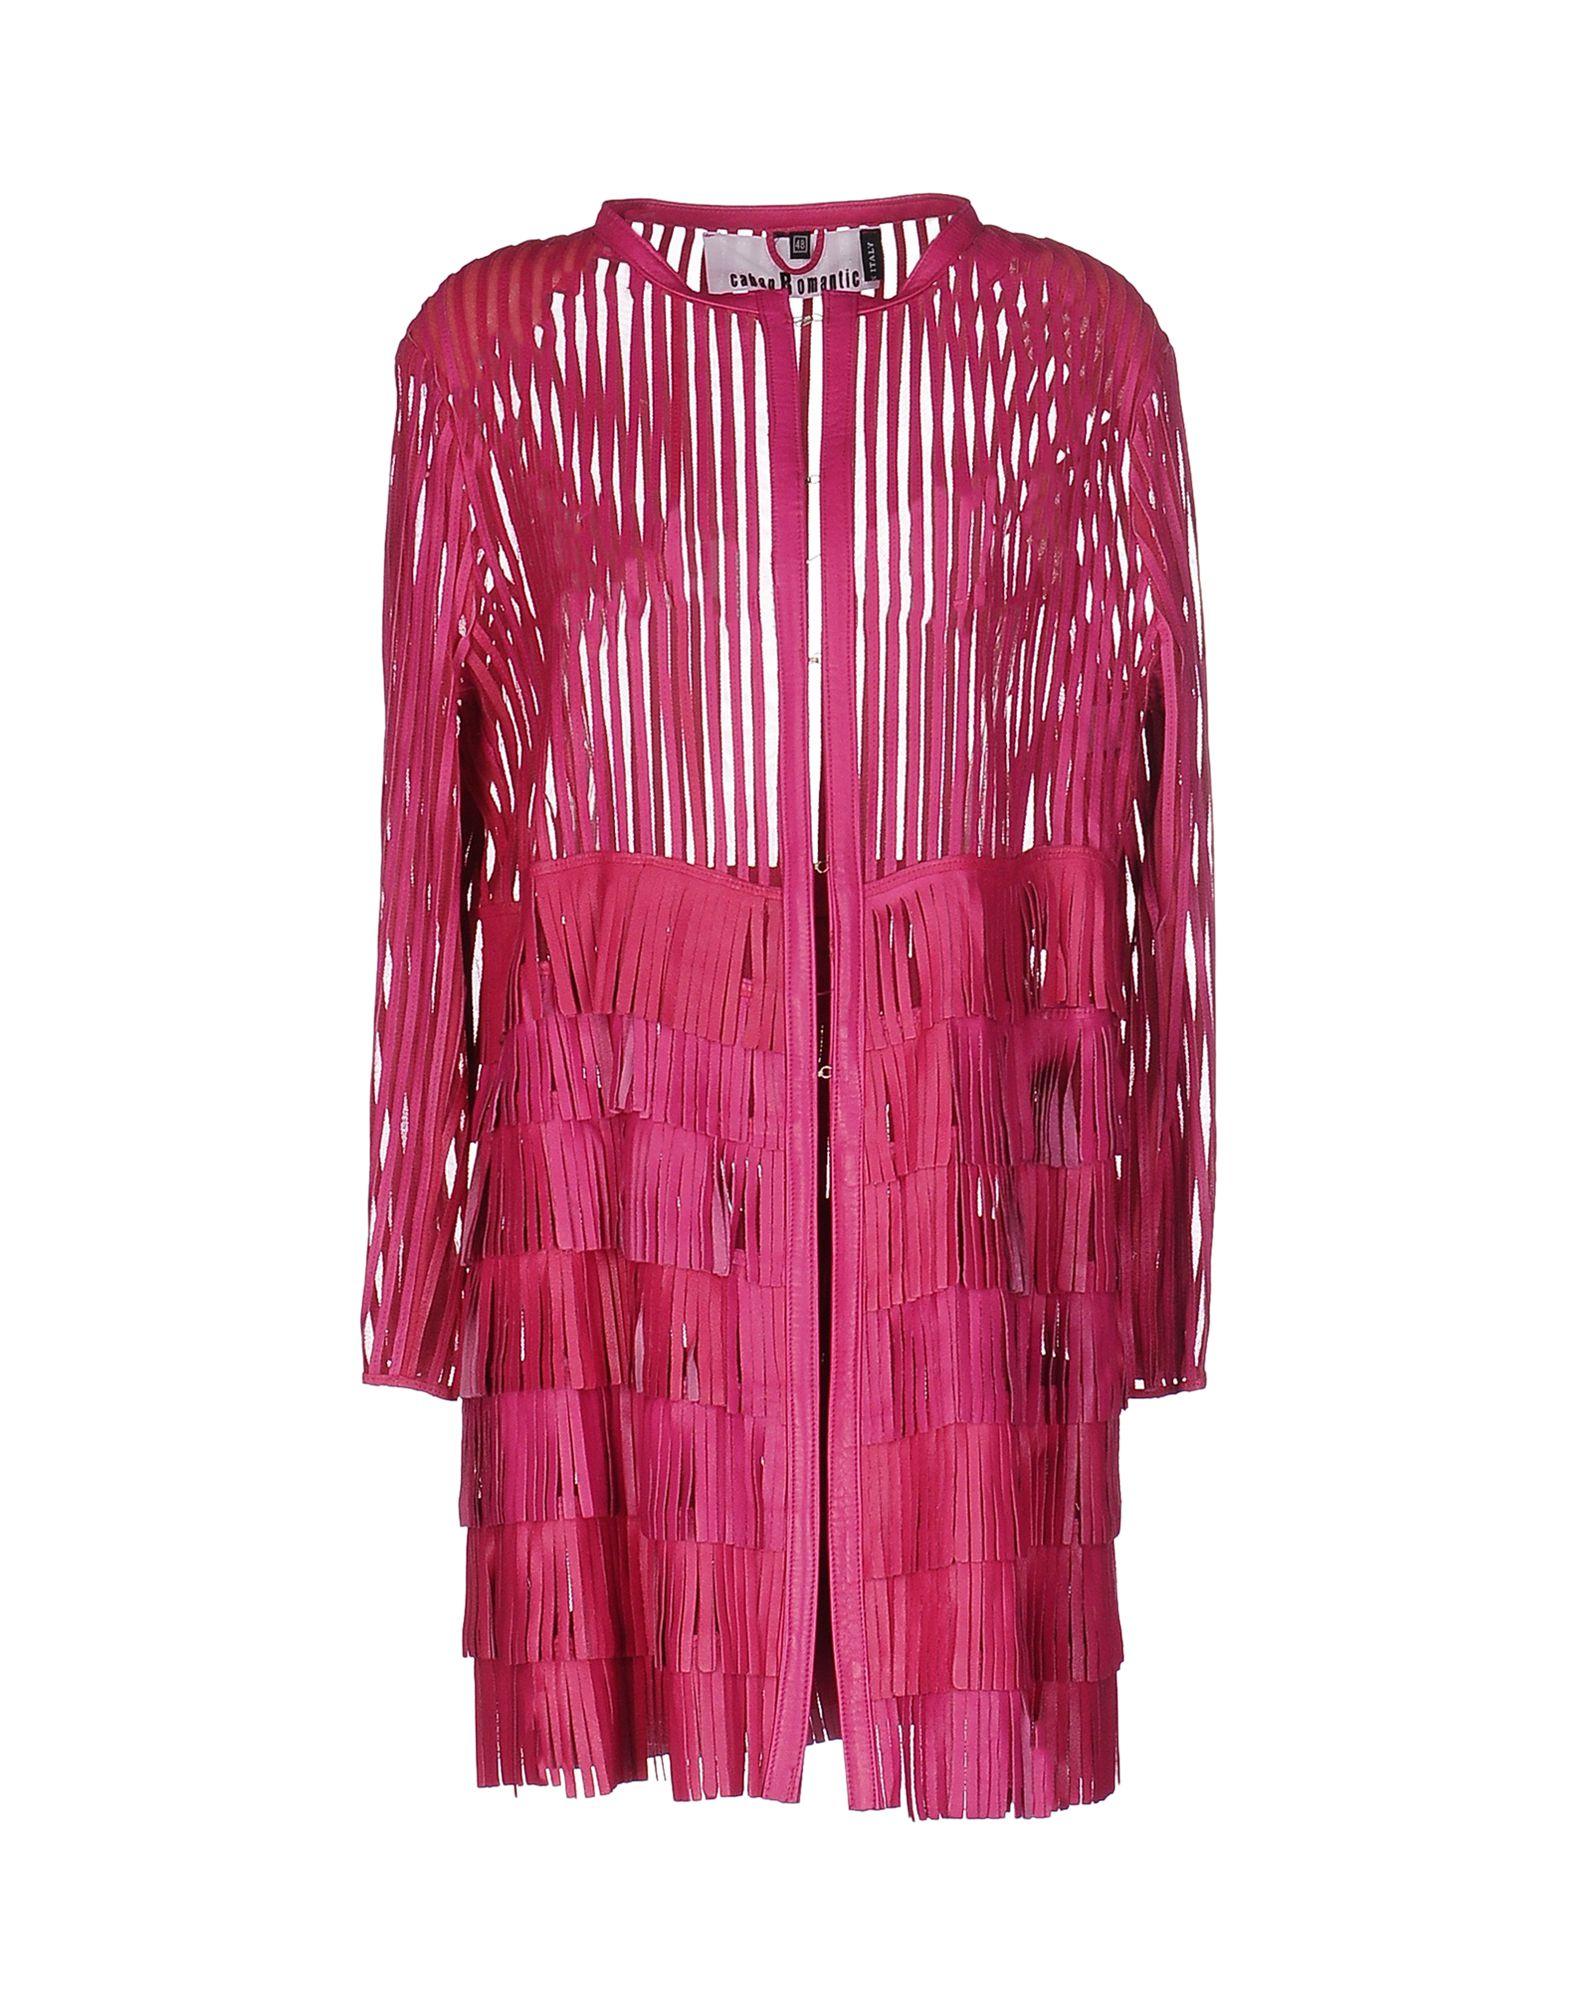 CABAN ROMANTIC Damen Lange Jacke Farbe Fuchsia Größe 7